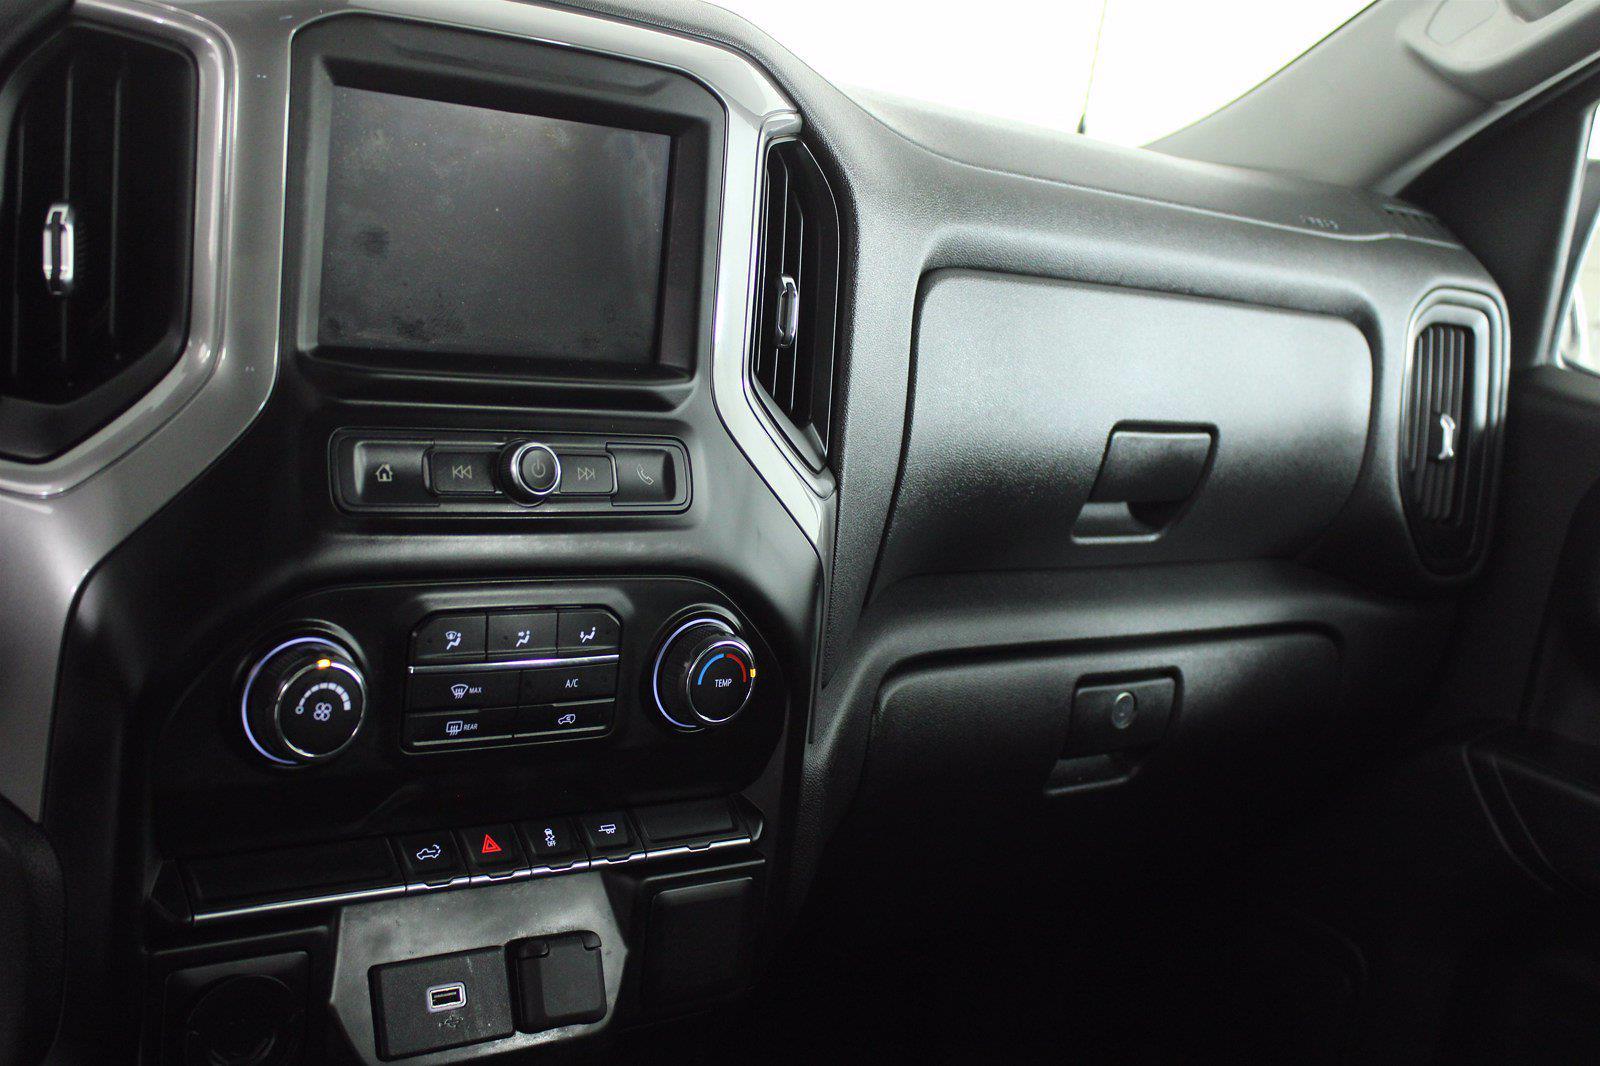 2020 Chevrolet Silverado 1500 Crew Cab 4x2, Pickup #DTC1616 - photo 9